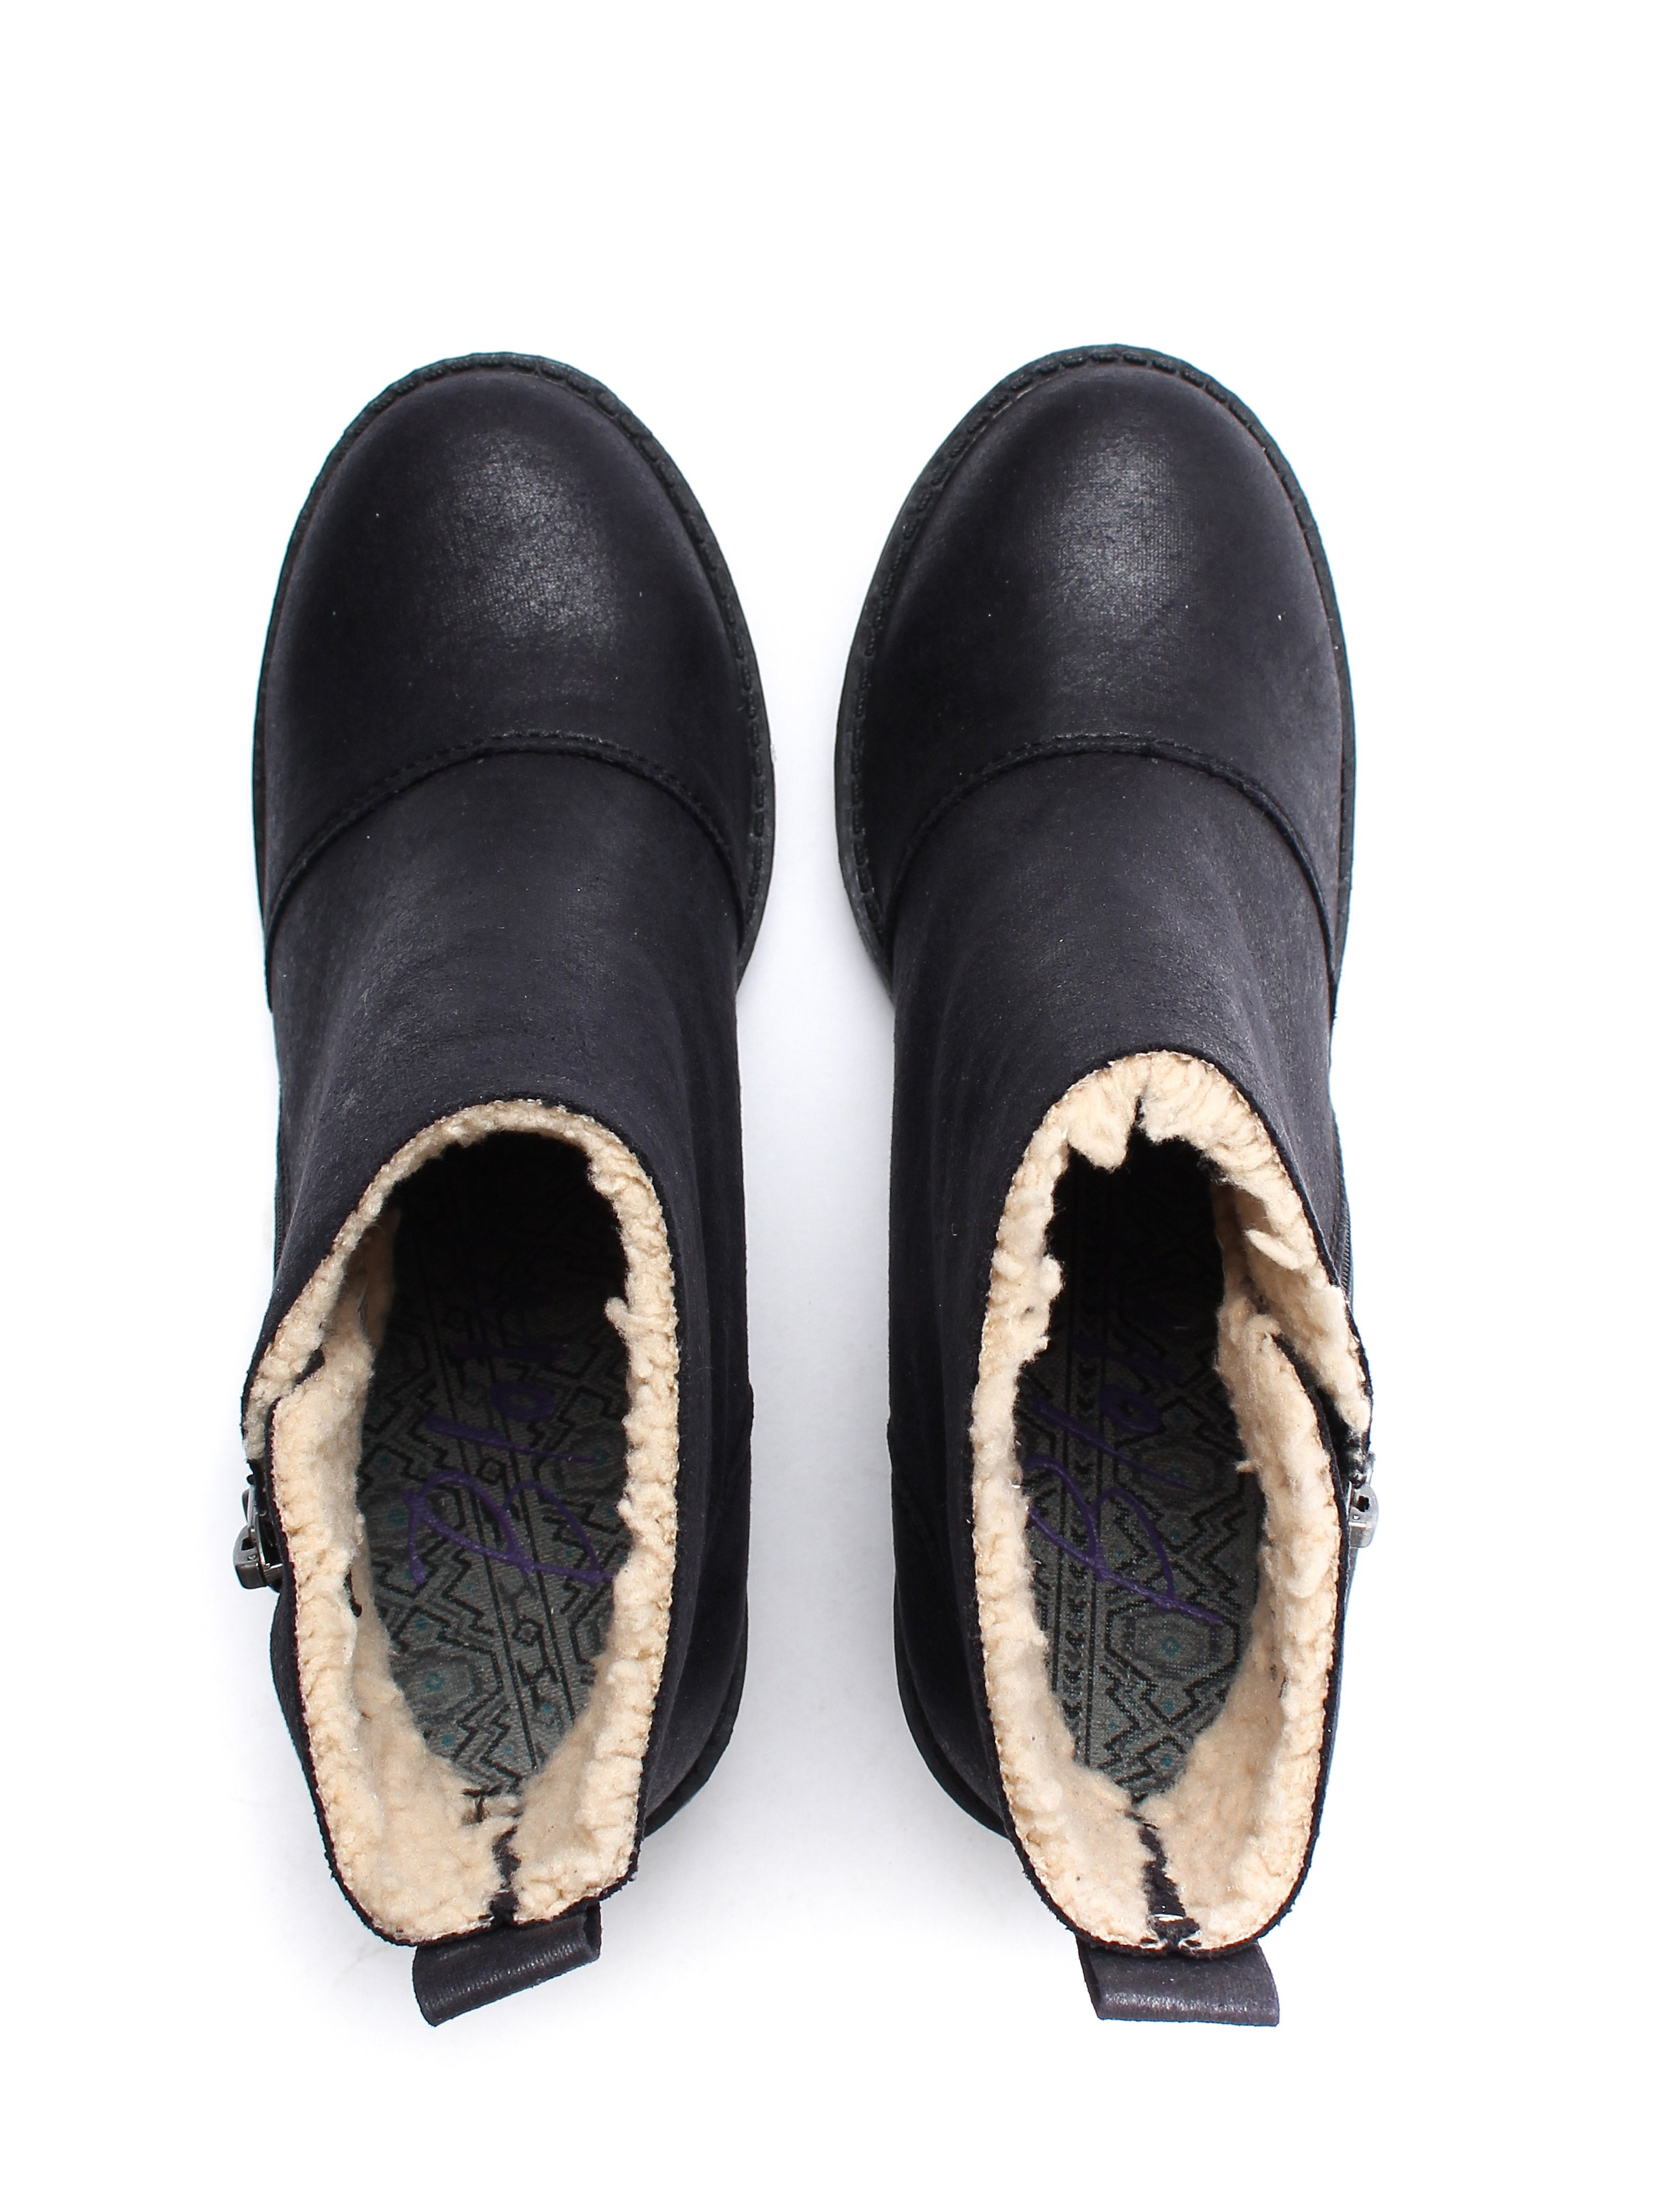 Blowfish Women's Jumper Shearling Heeled Boots - Black